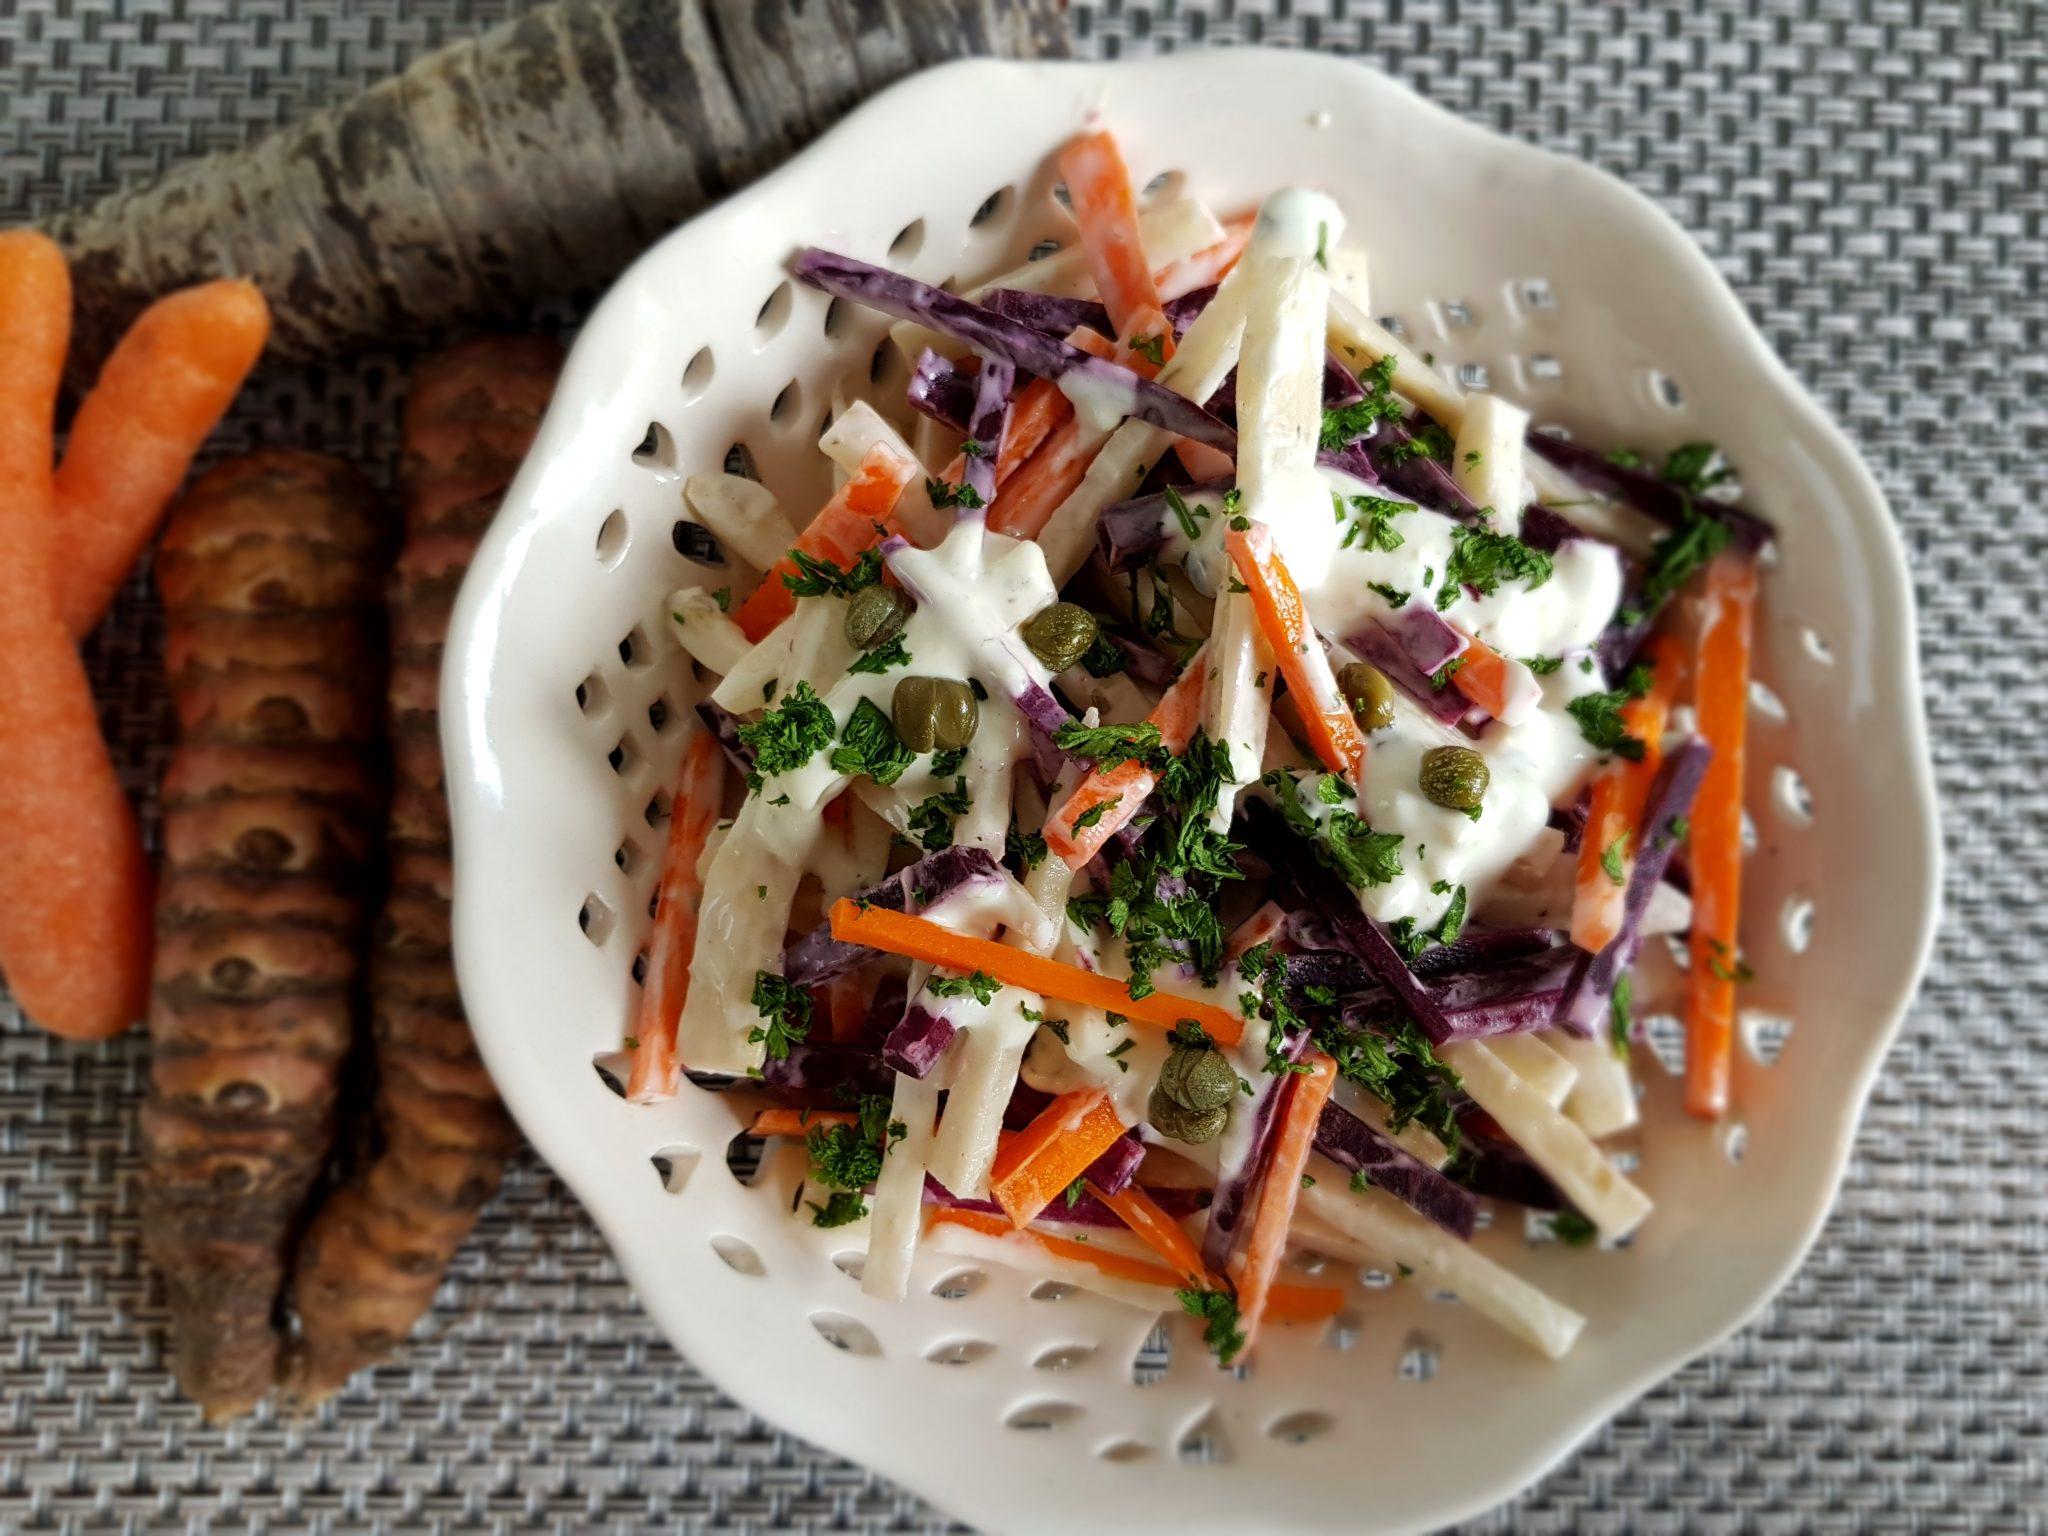 Salade met aardpeer en wortel